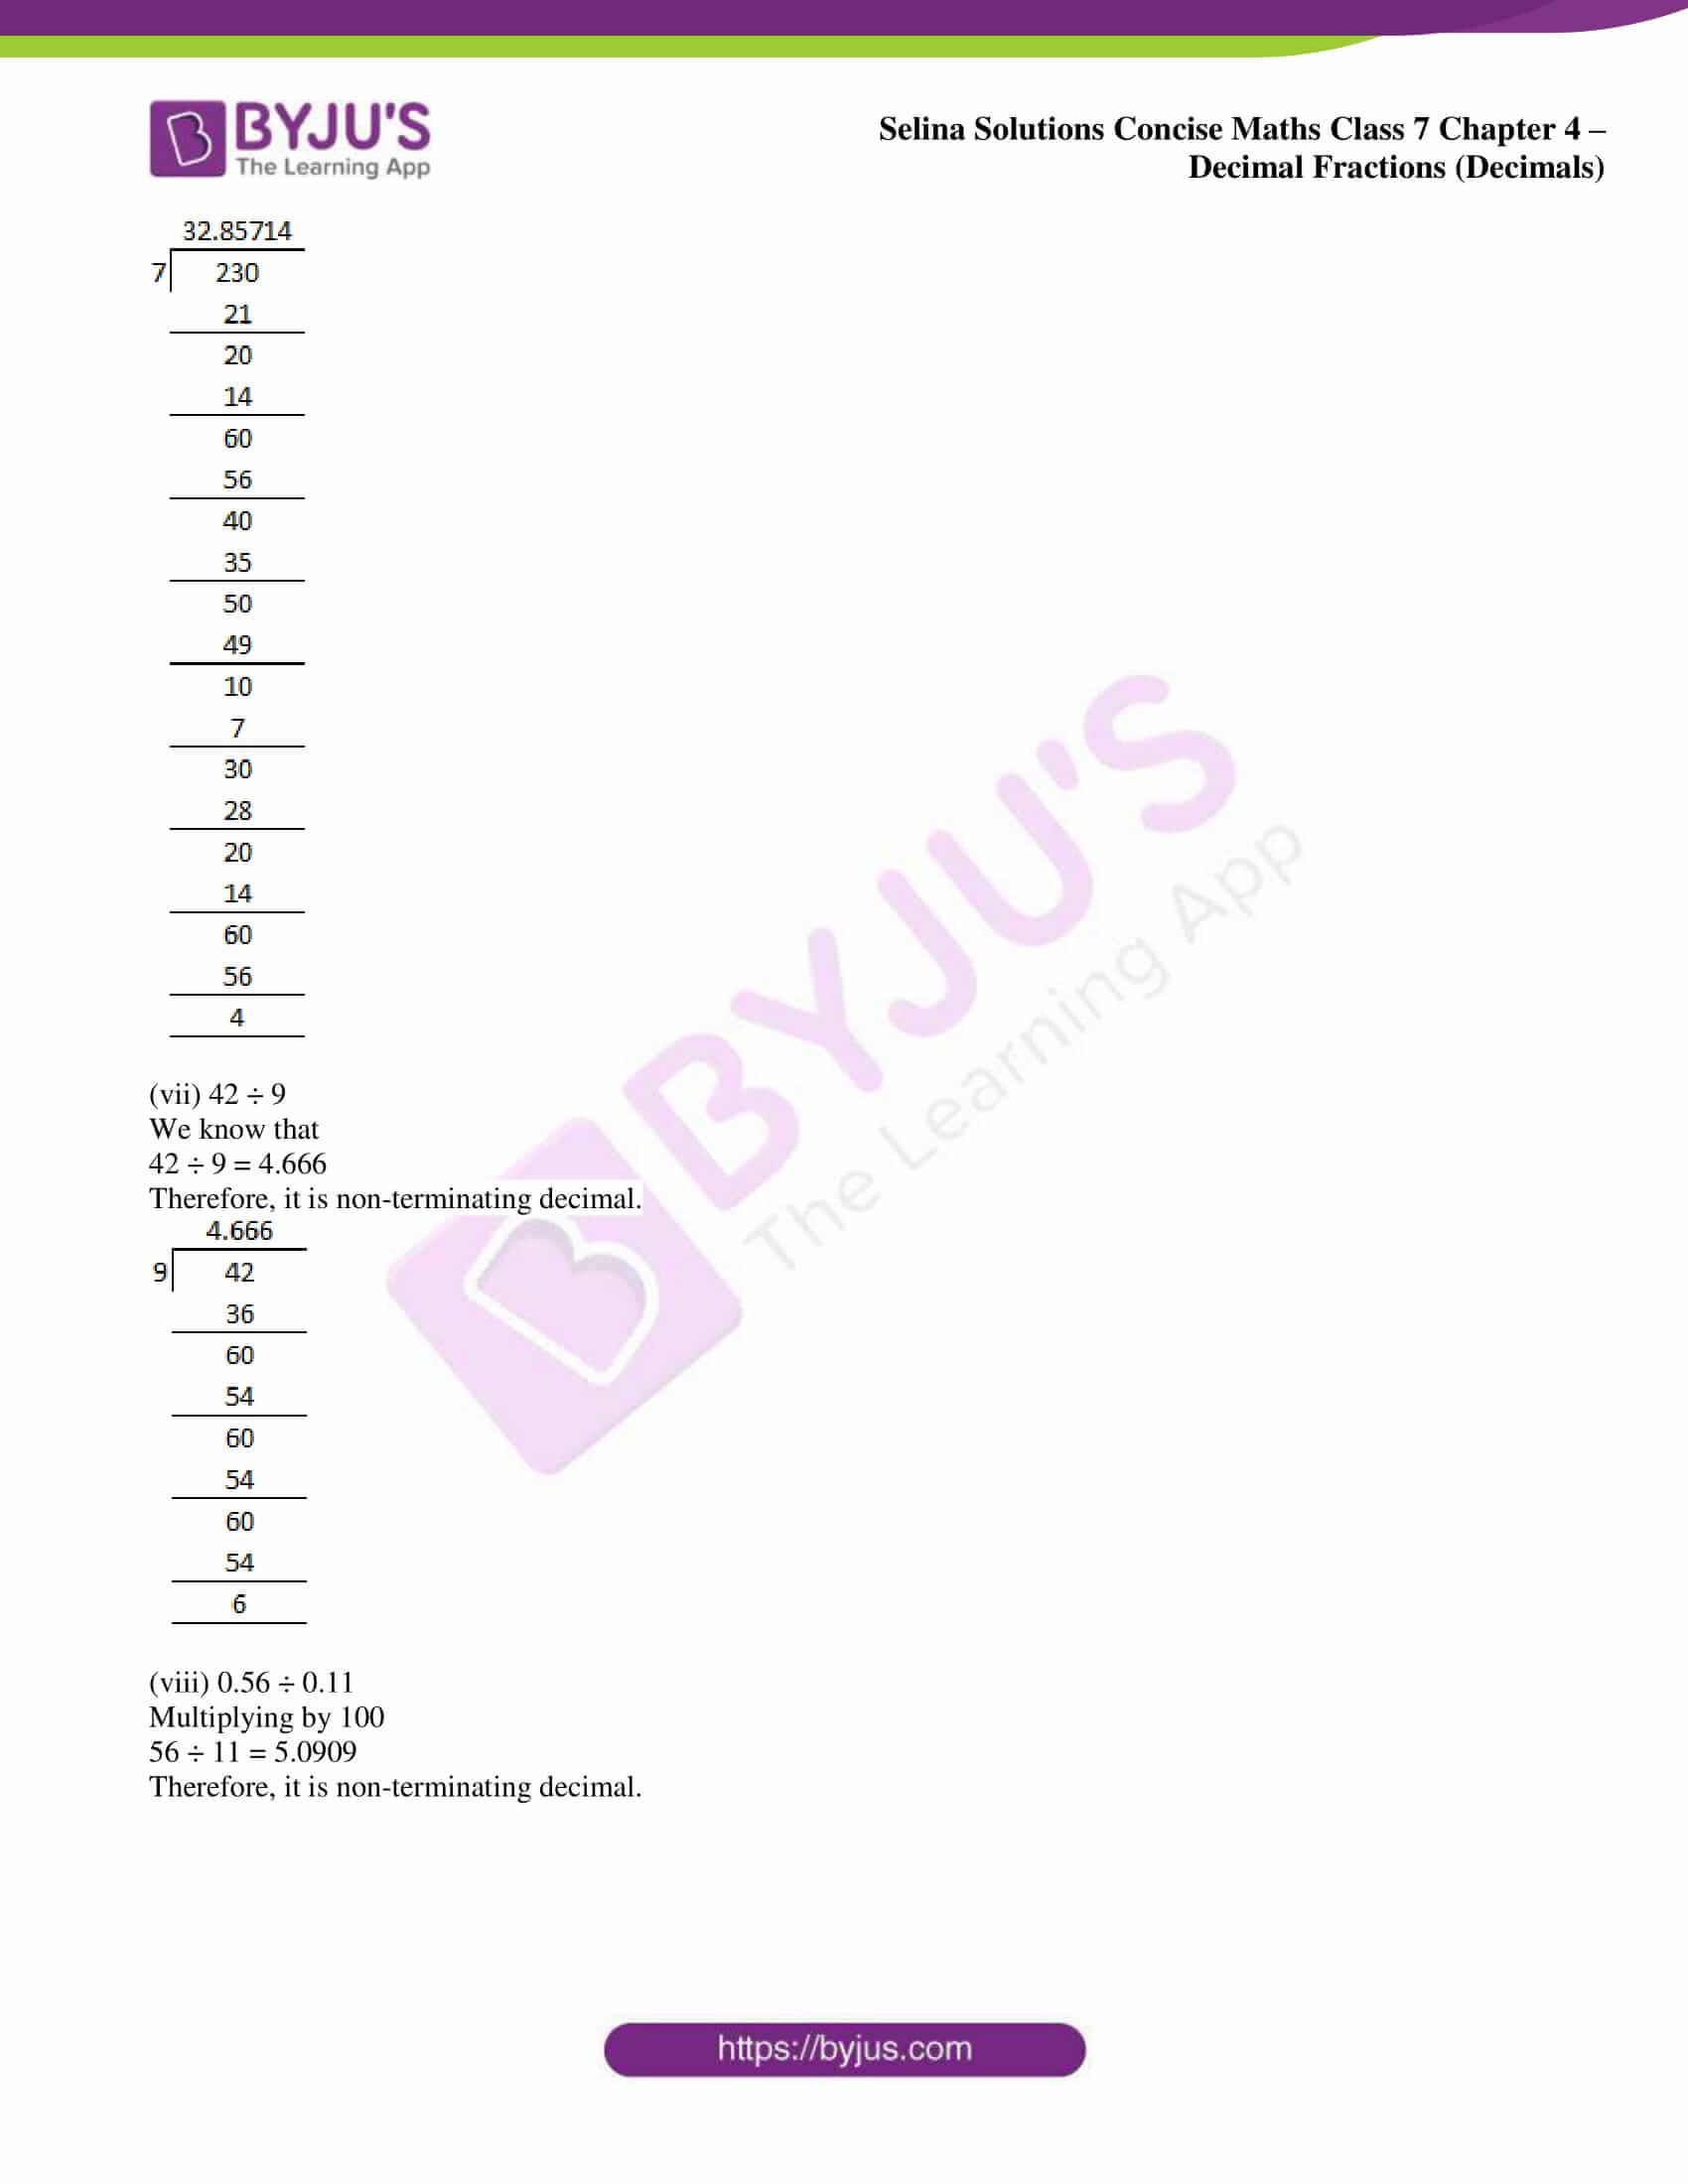 selina sol concise maths class 7 ch4 ex 4d 03